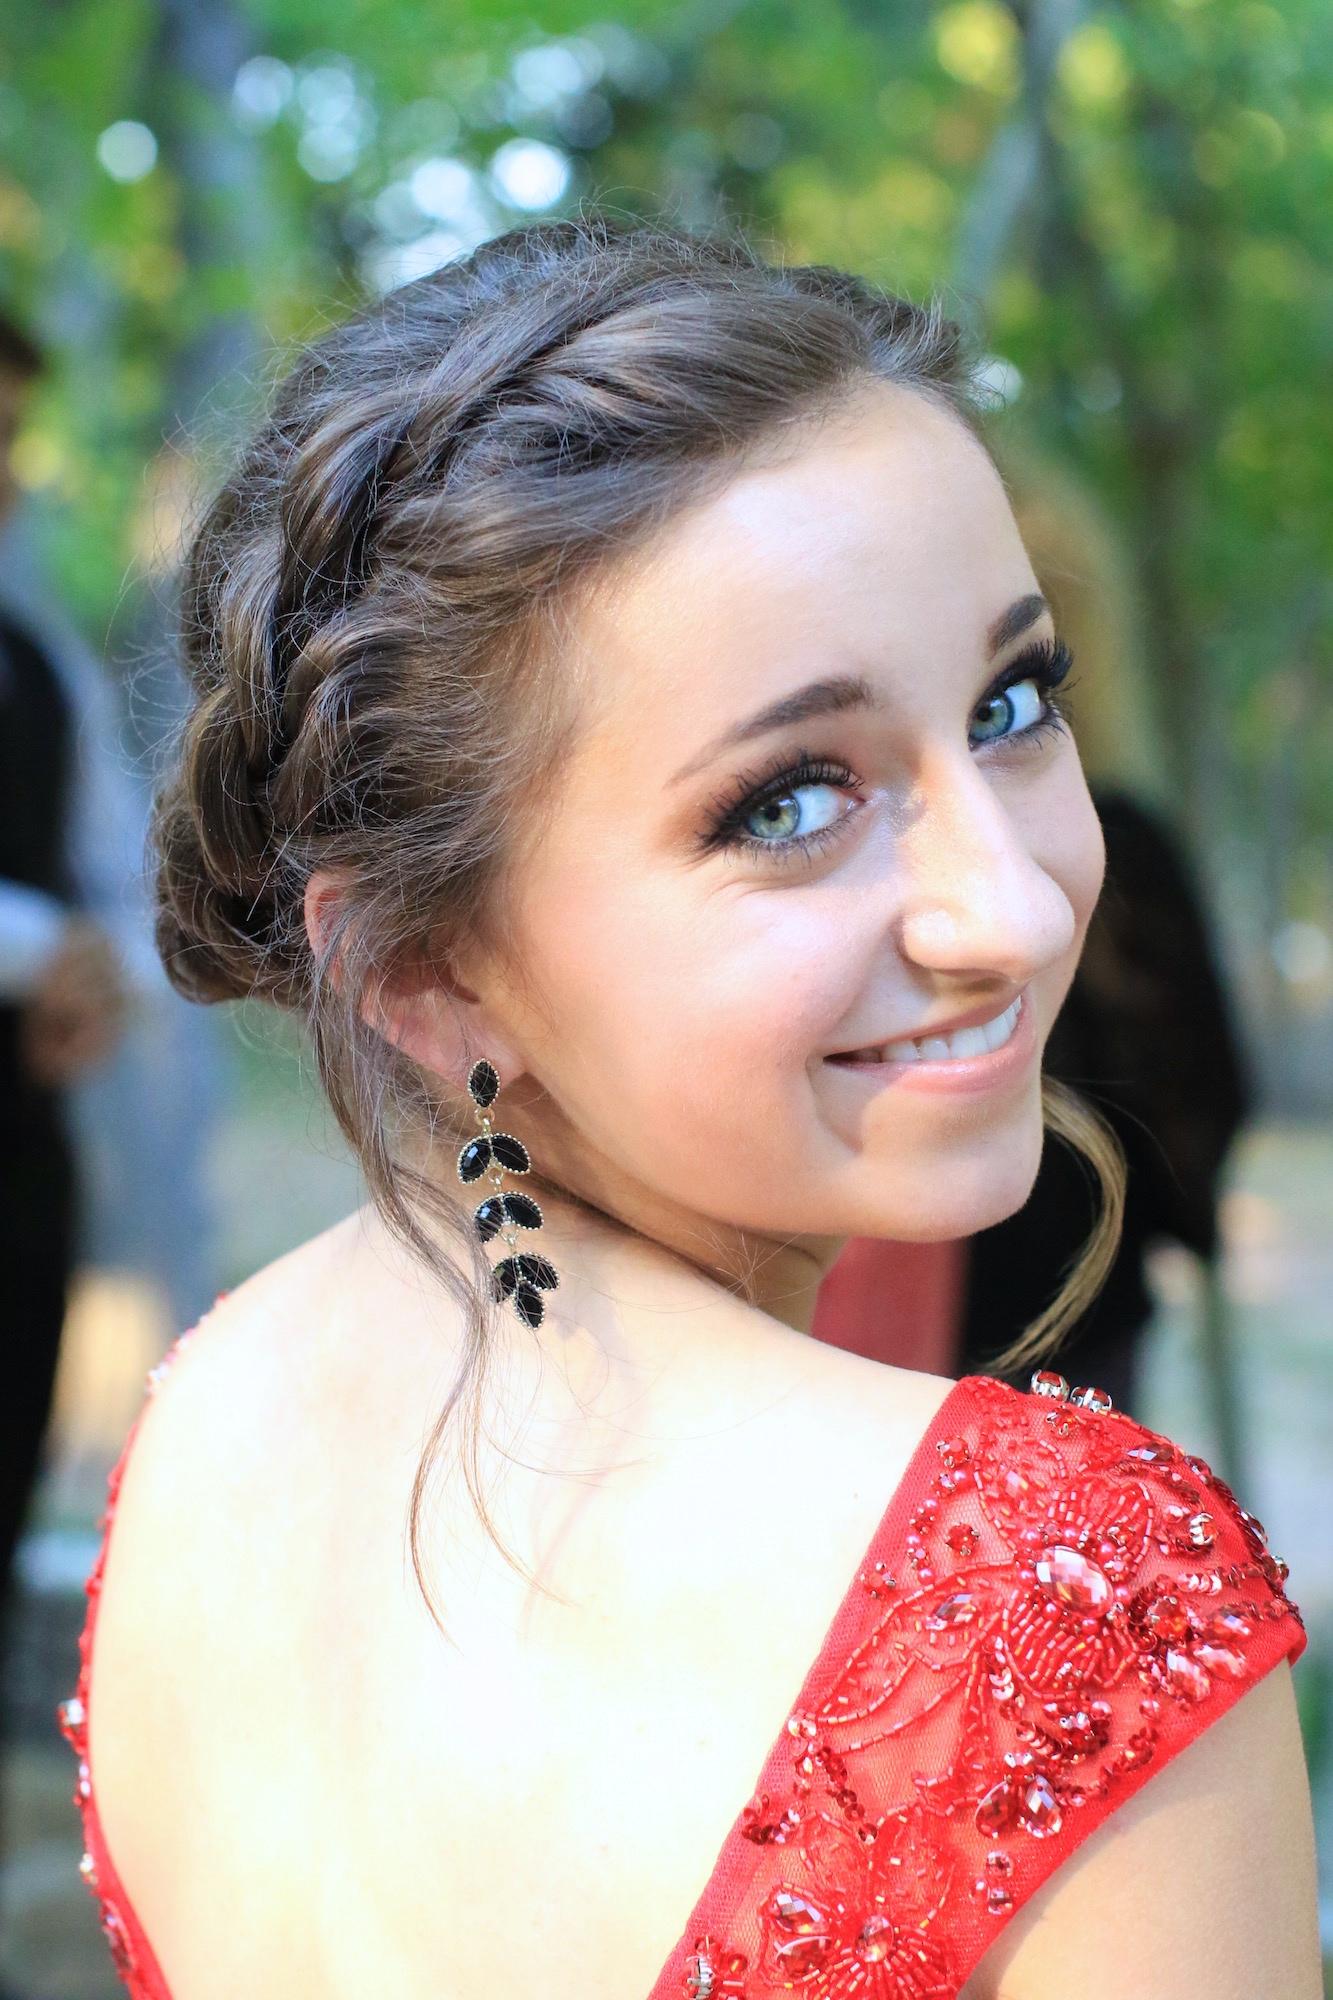 Rope Twist Updo | Homecoming Hairstyles | Cute Girls ...